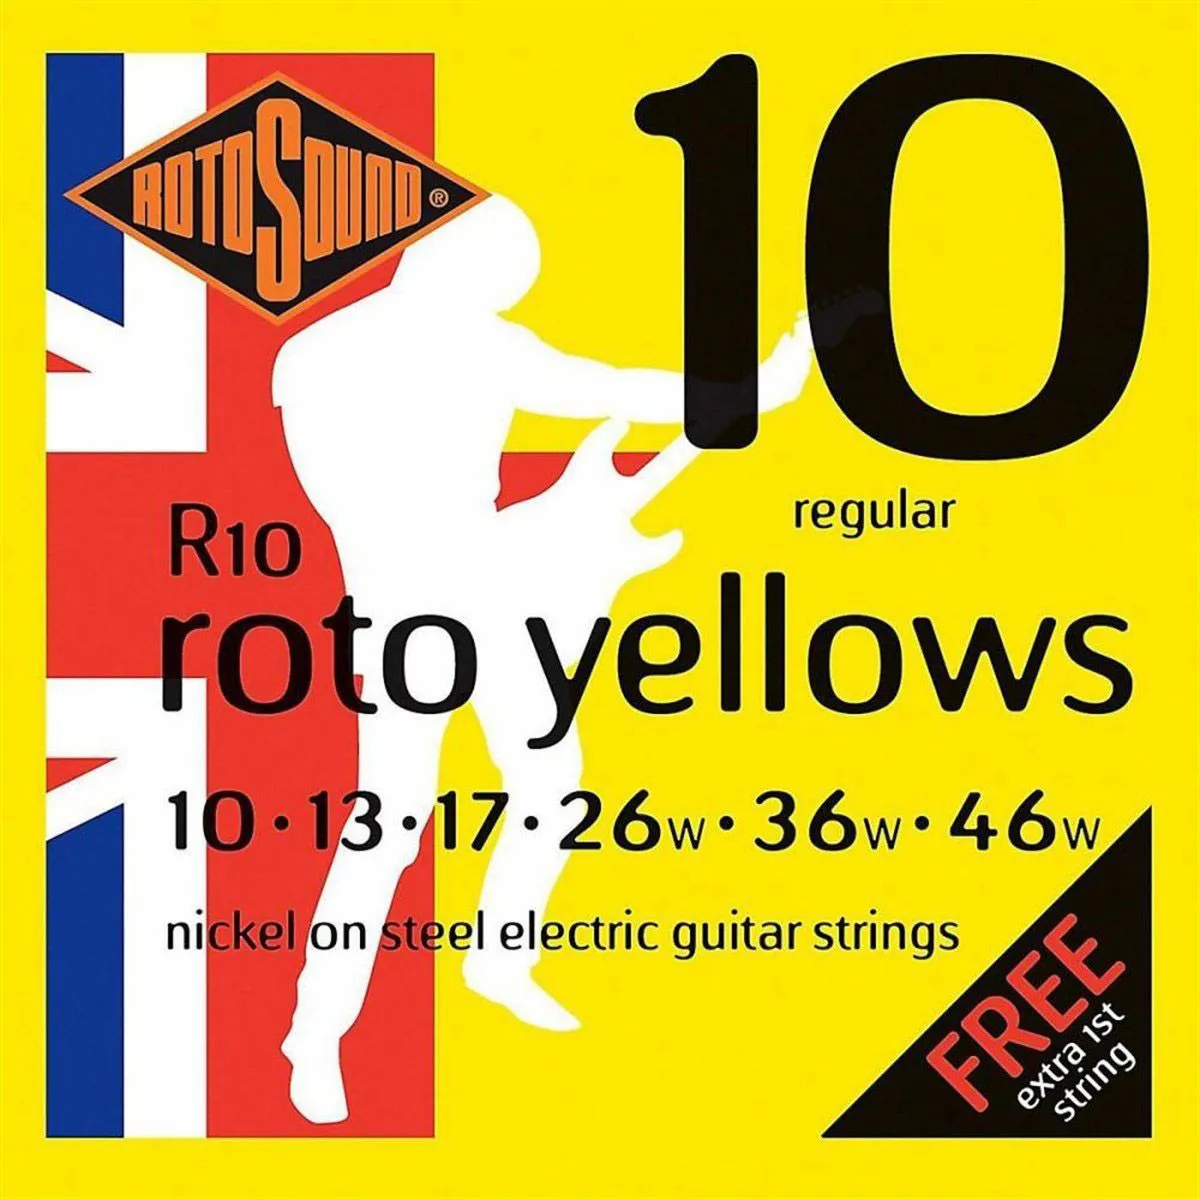 Encordoamento Rotosound R10 Yellow 010/046 para Guitarra